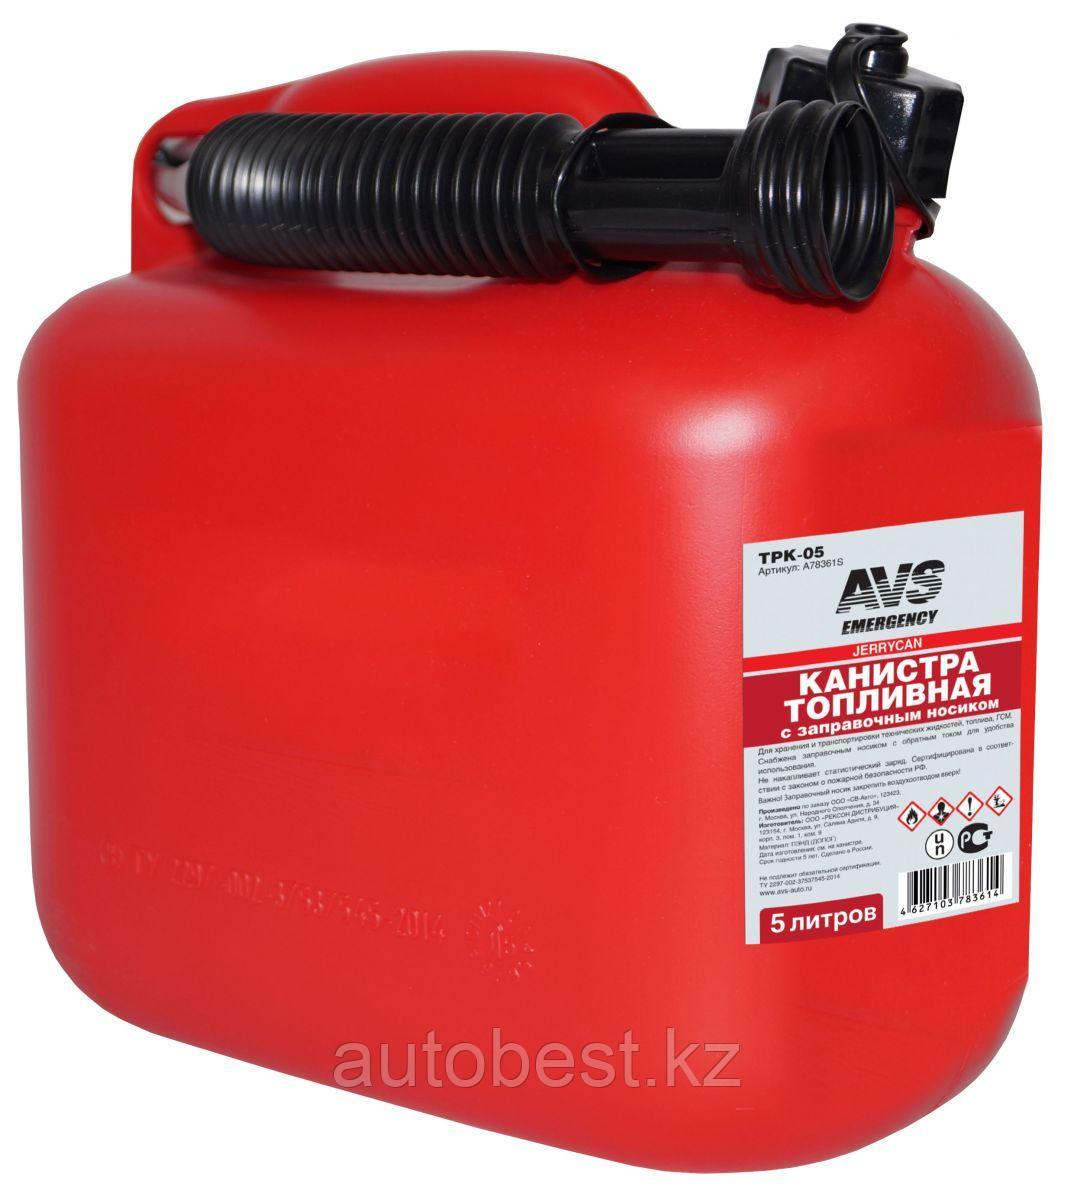 Канистра топливная пластик 5л. AVS TPK-05